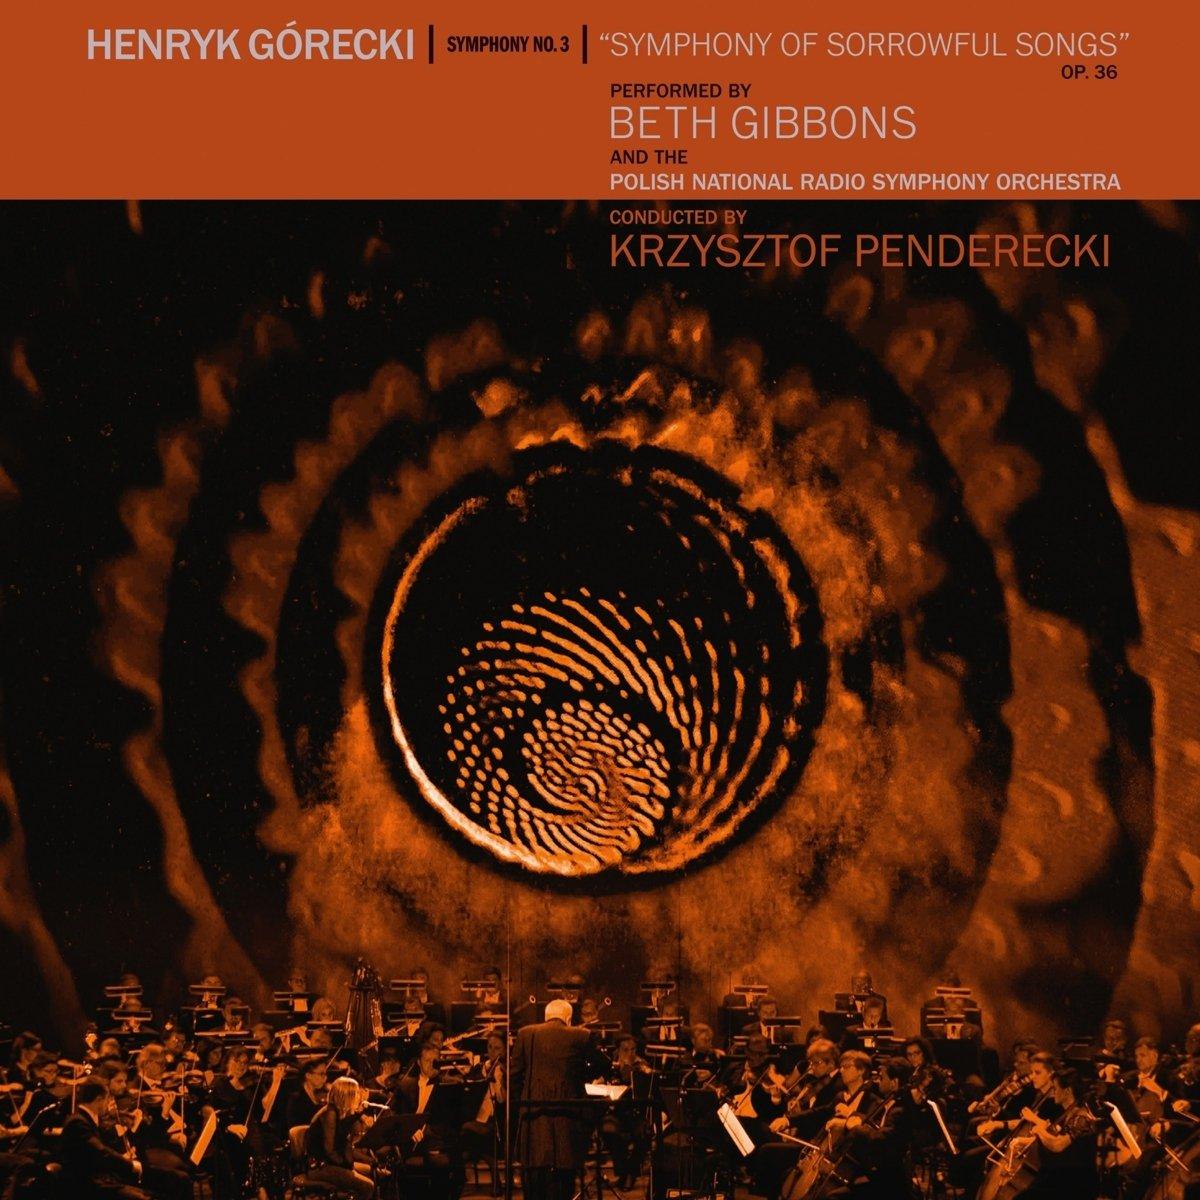 Beth Gibbons / Krzysztof Penderecki - Henryk Górecki: Symphony No. 3  (Symphony of Sorrowful Songs) | Music Review | Tiny Mix Tapes